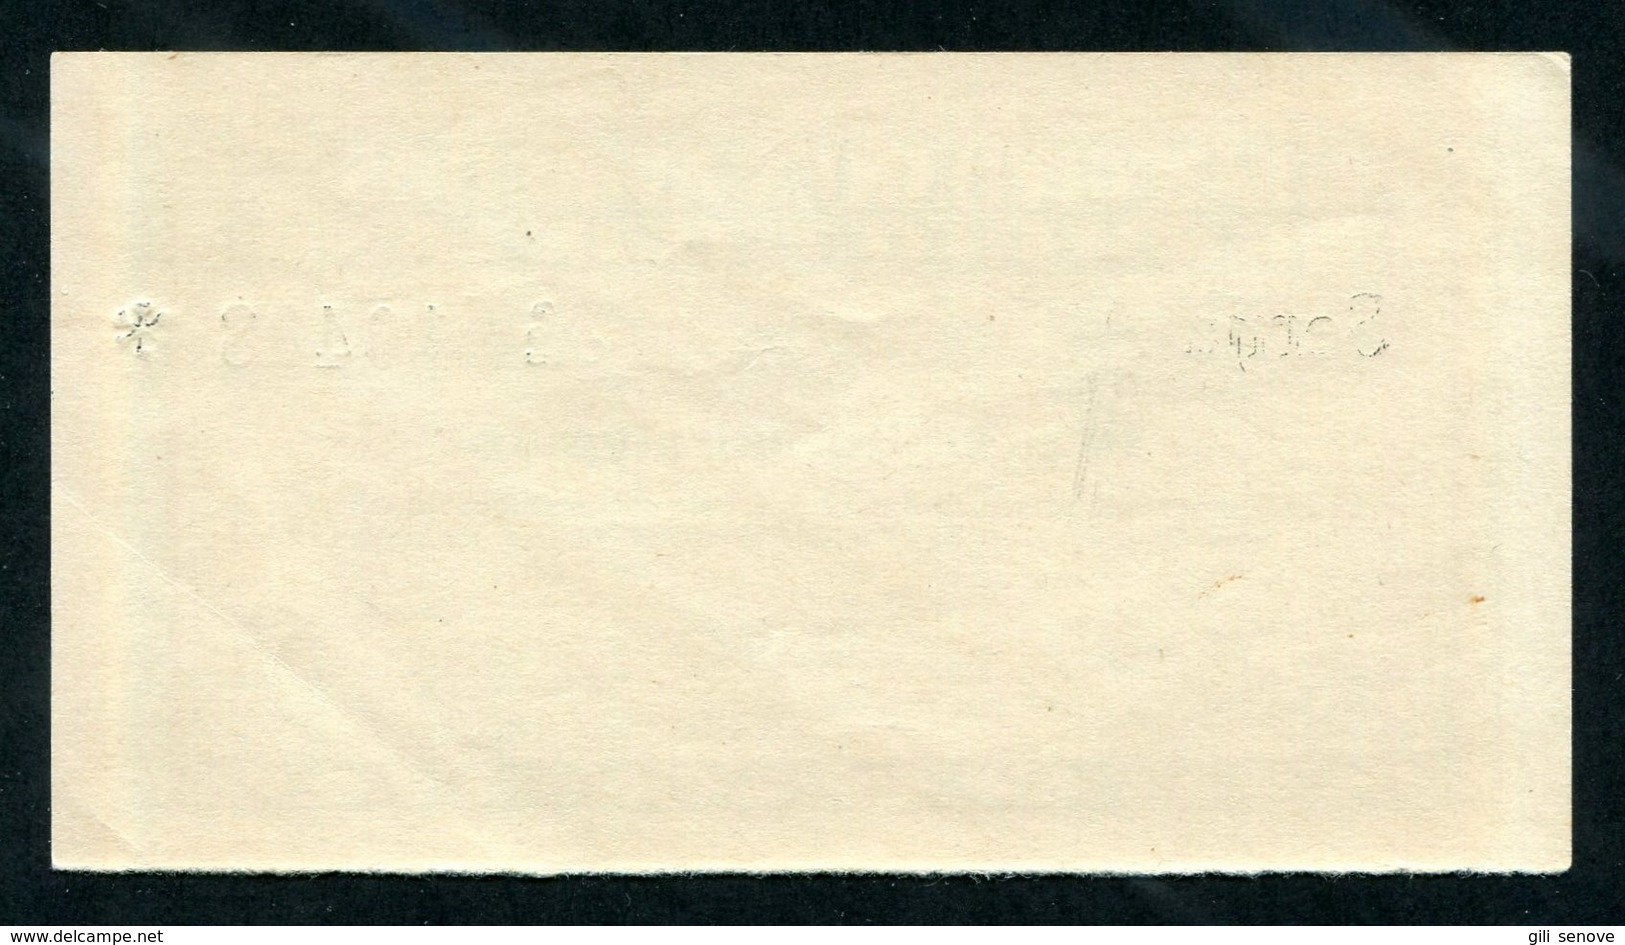 Lithuania Lottery Ticket 1938 Series: A 10408, IV Civil Aviation - Lituanie